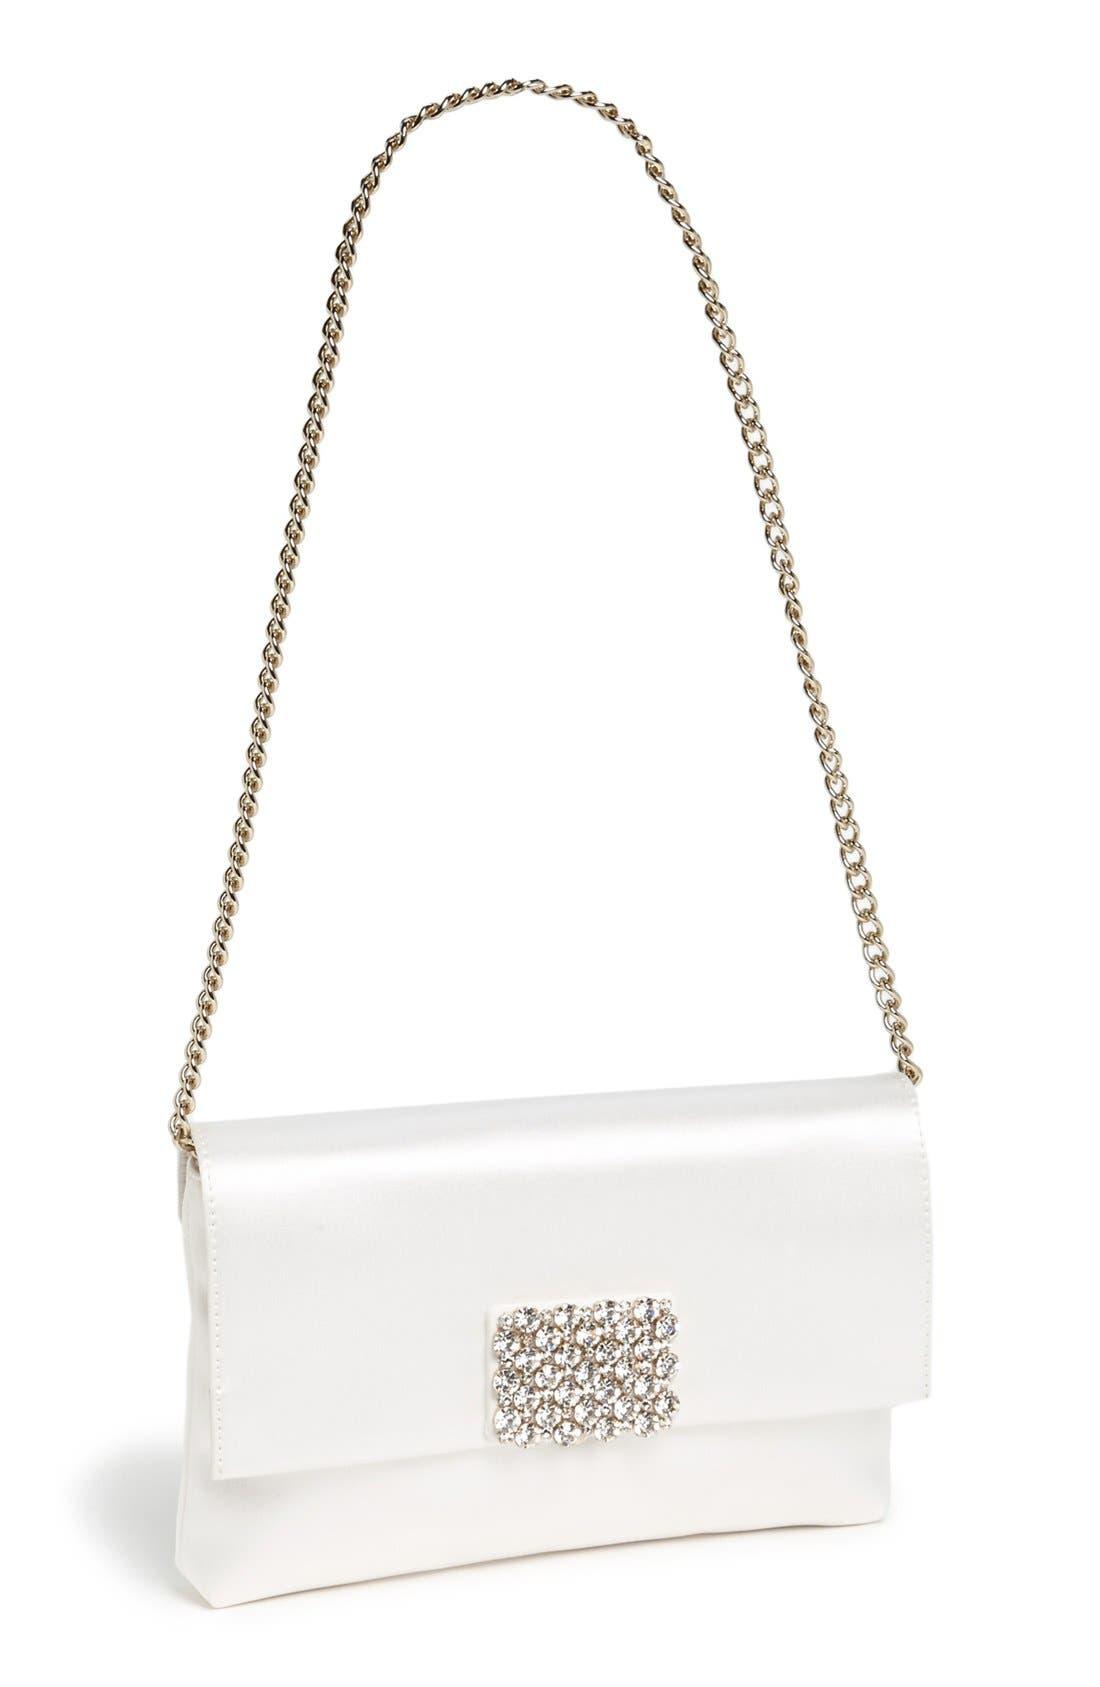 Alternate Image 1 Selected - kate spade new york 'alouette - wedding belles' handbag